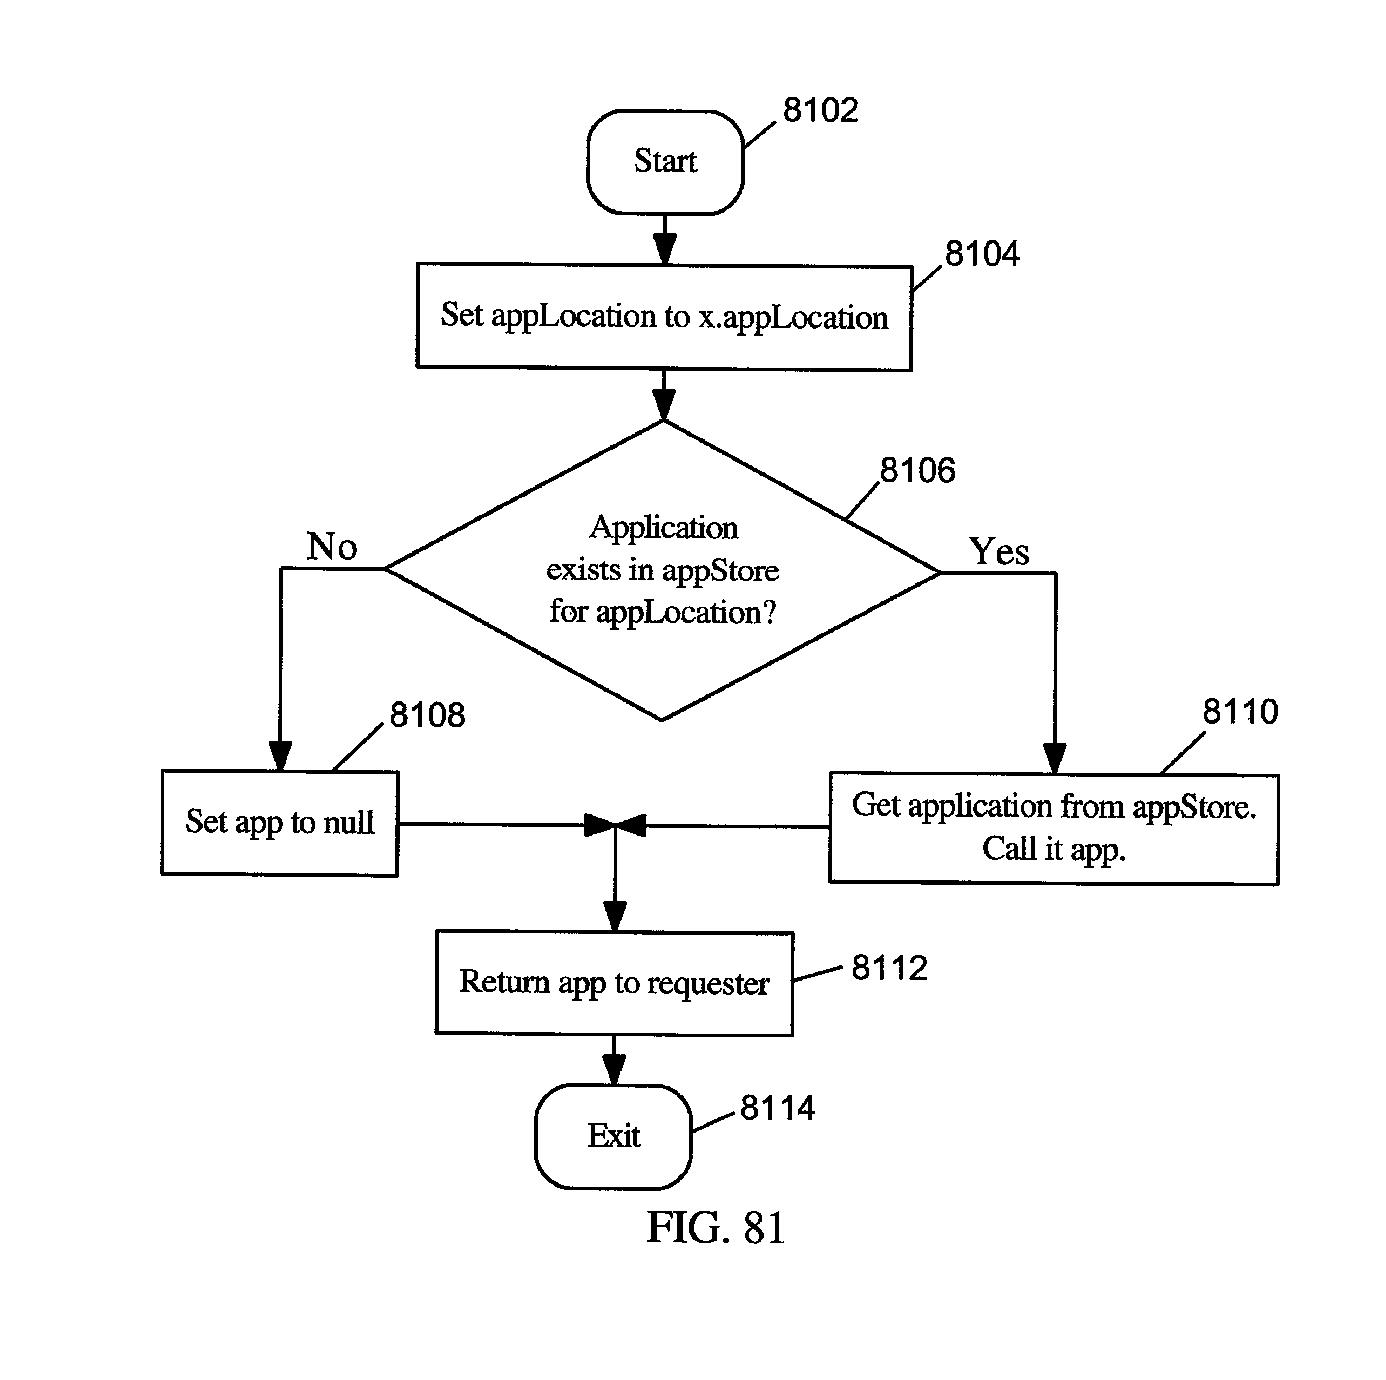 Patent US 9,215,273 B2